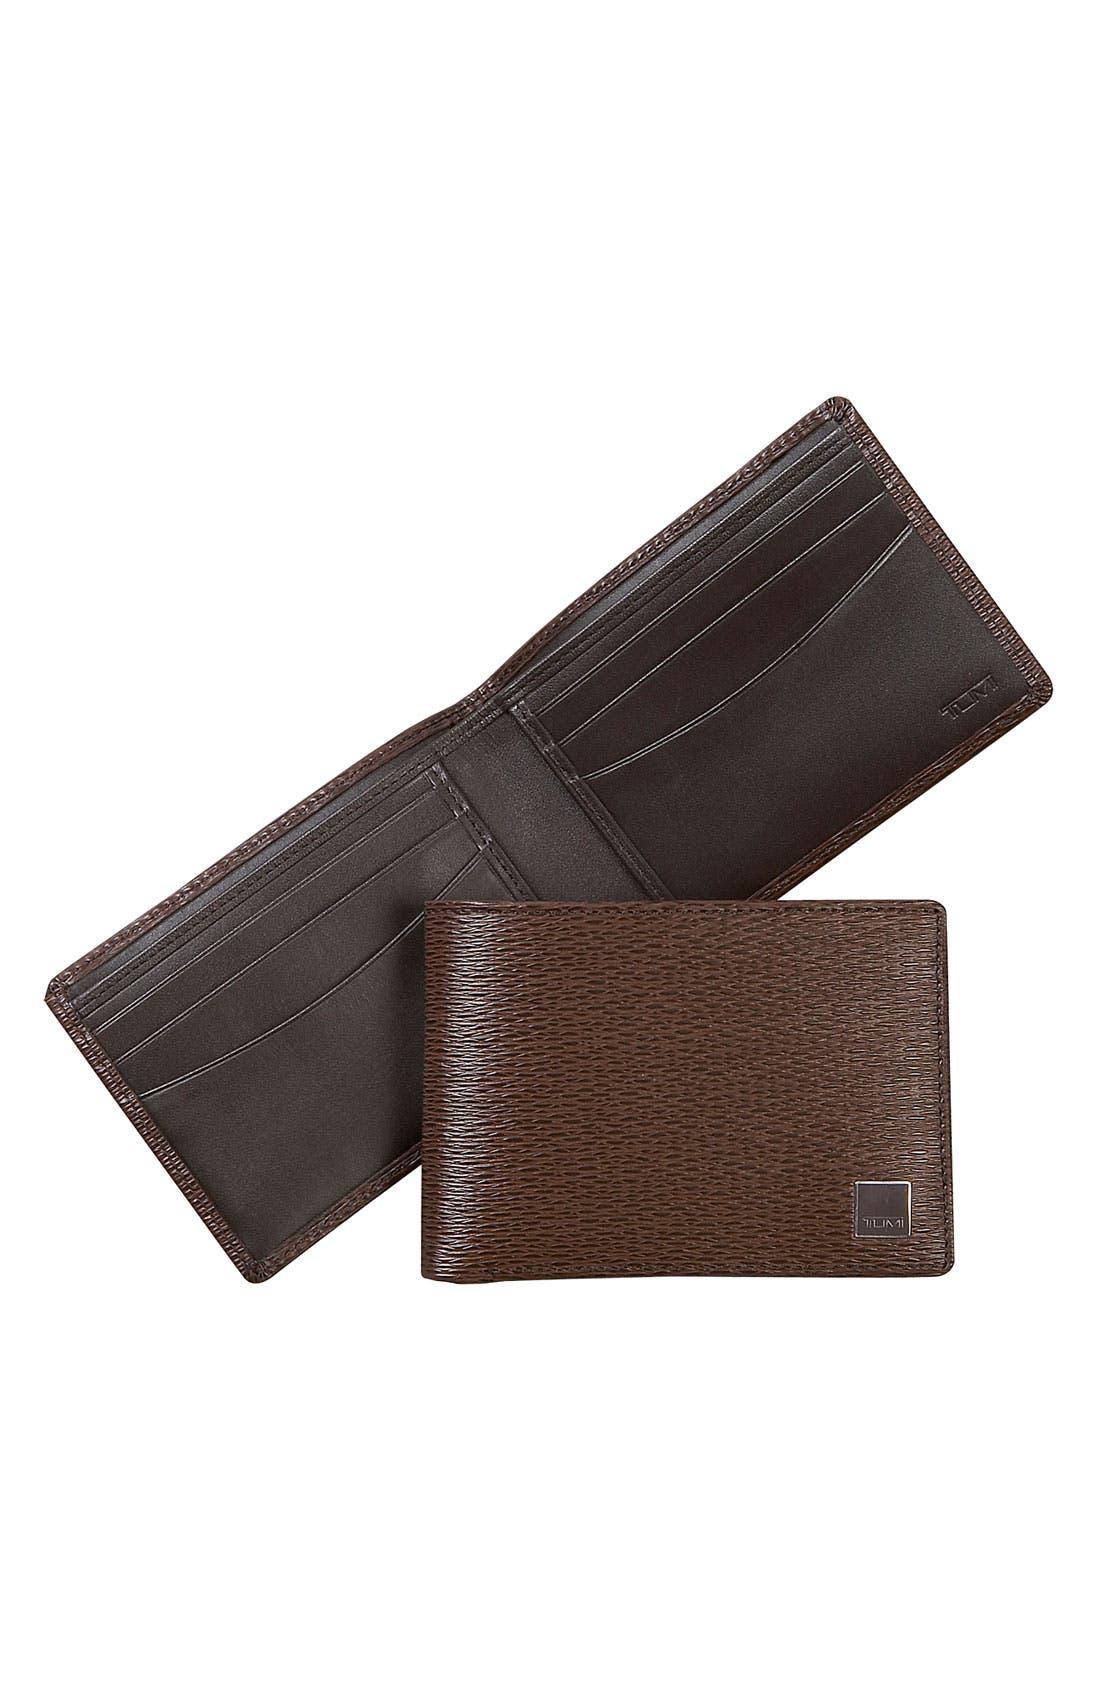 Alternate Image 1 Selected - Tumi 'Monaco' Slim Single Billfold Wallet